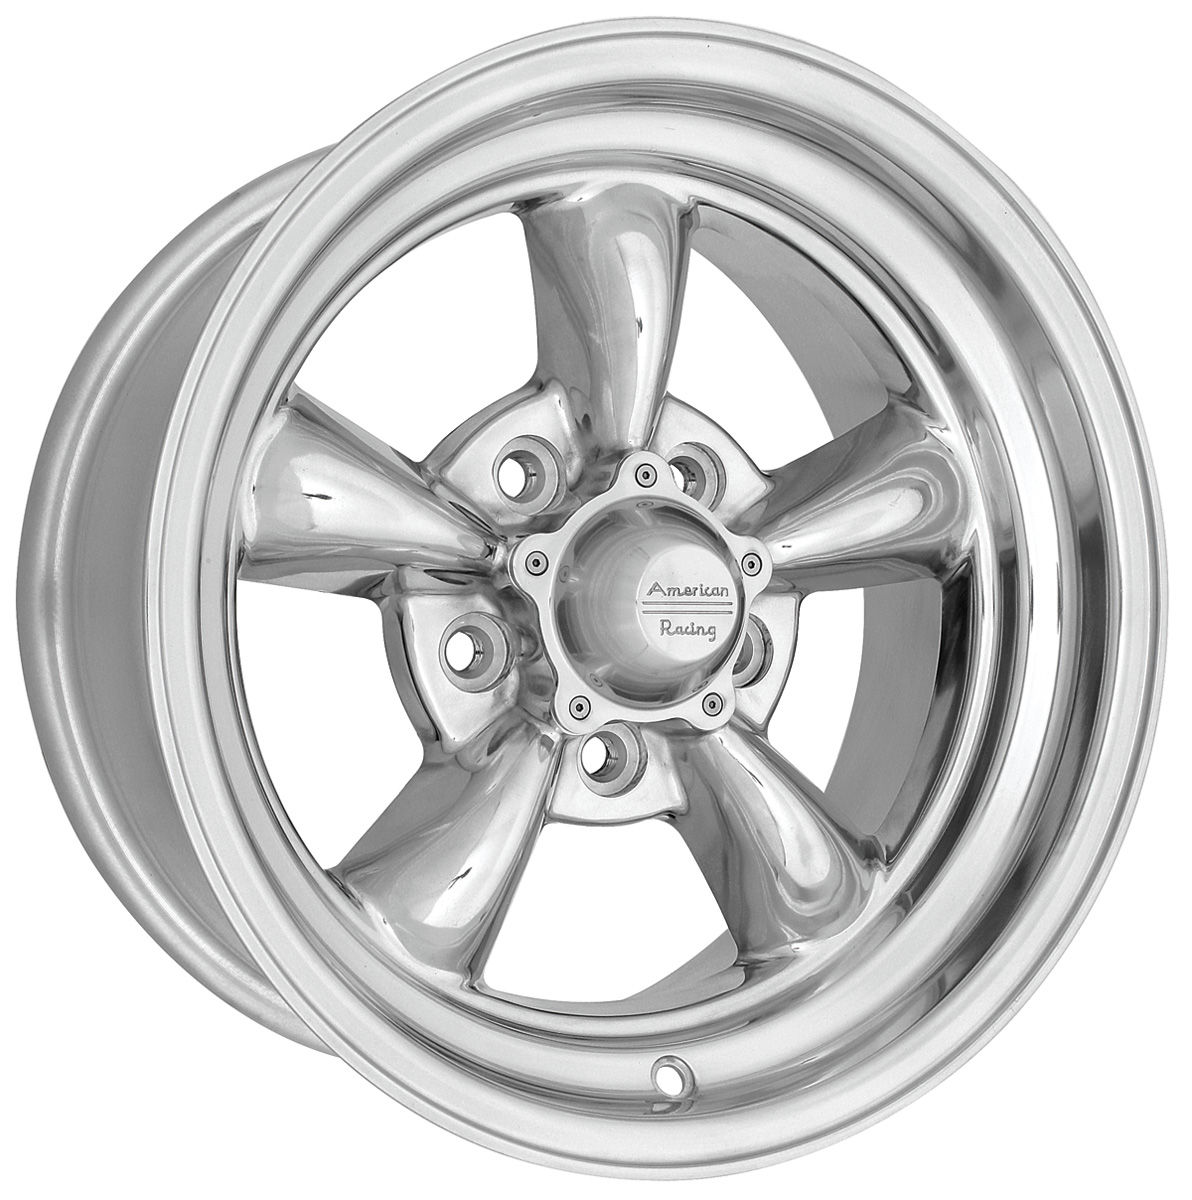 1961 77 Cutlass 442 Wheels Torq Thrust Ii 17 Quot X 7 Quot 4 Quot Bs